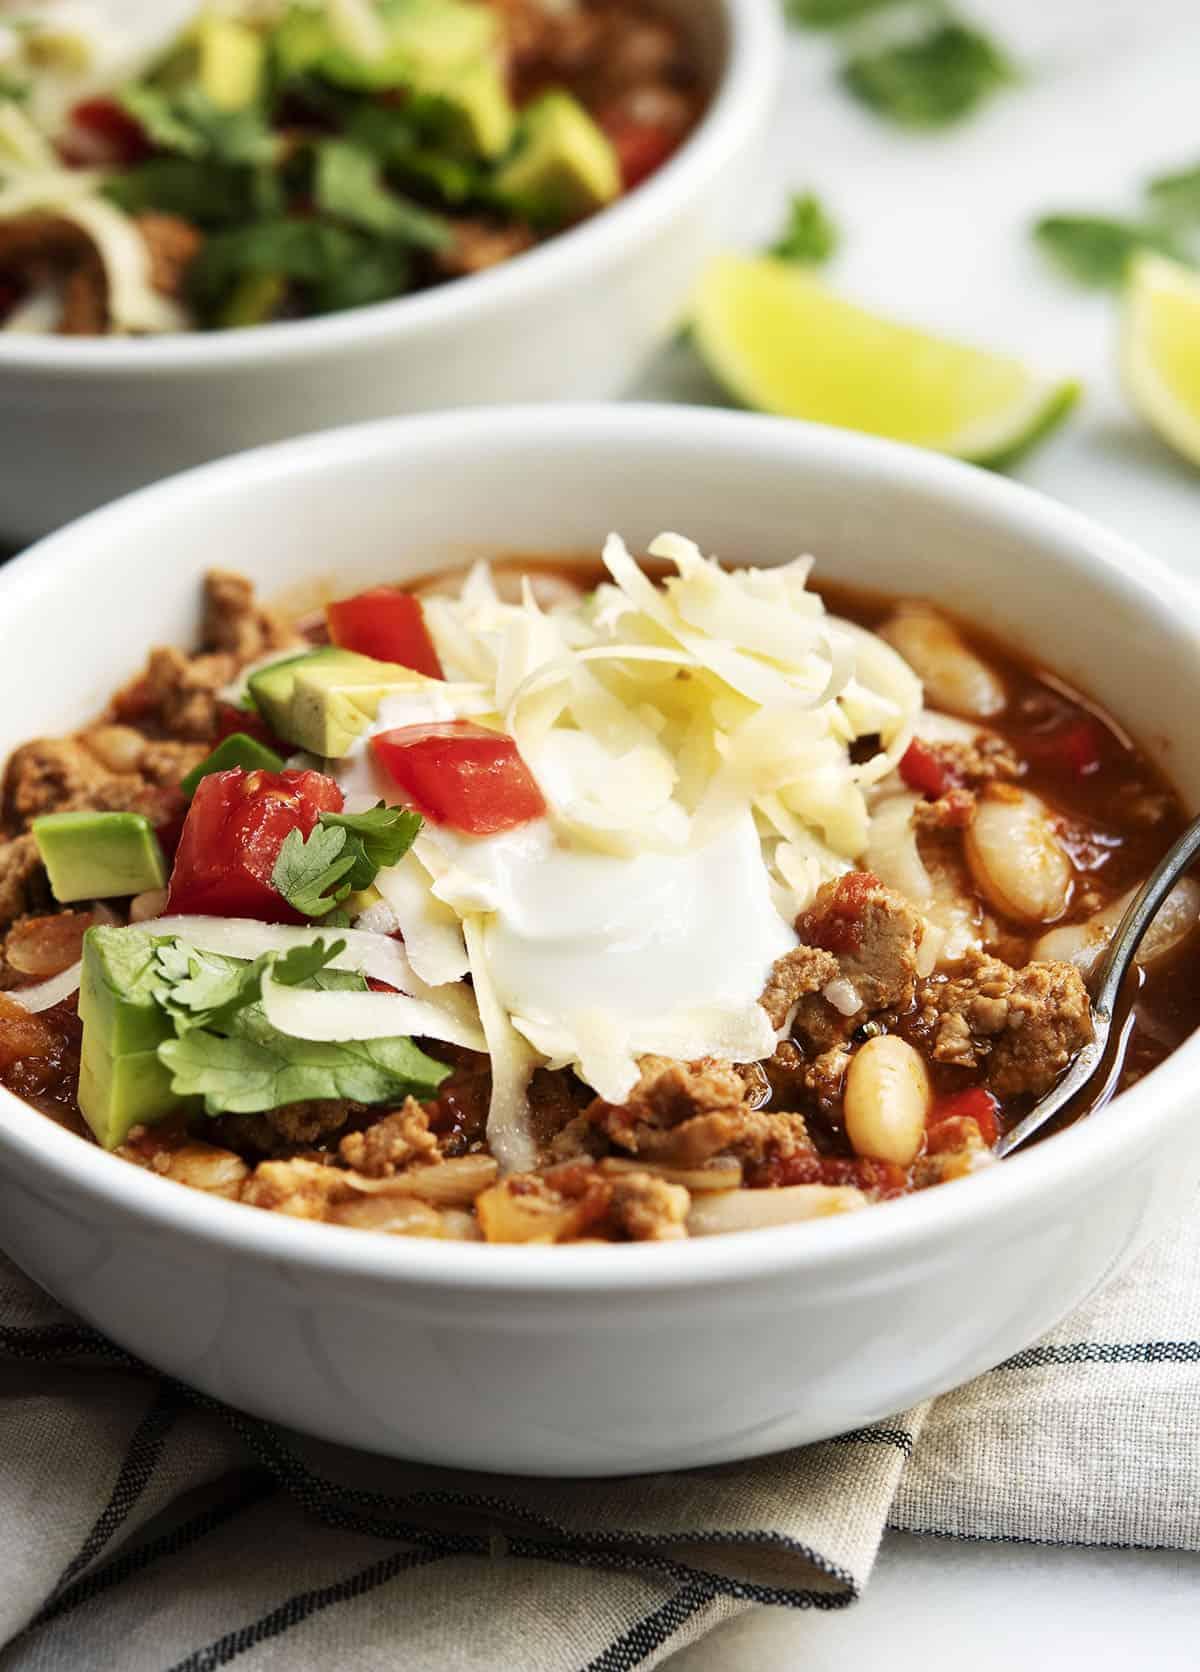 White Bean Turkey Chili served in white bowls with linen napkin underneath